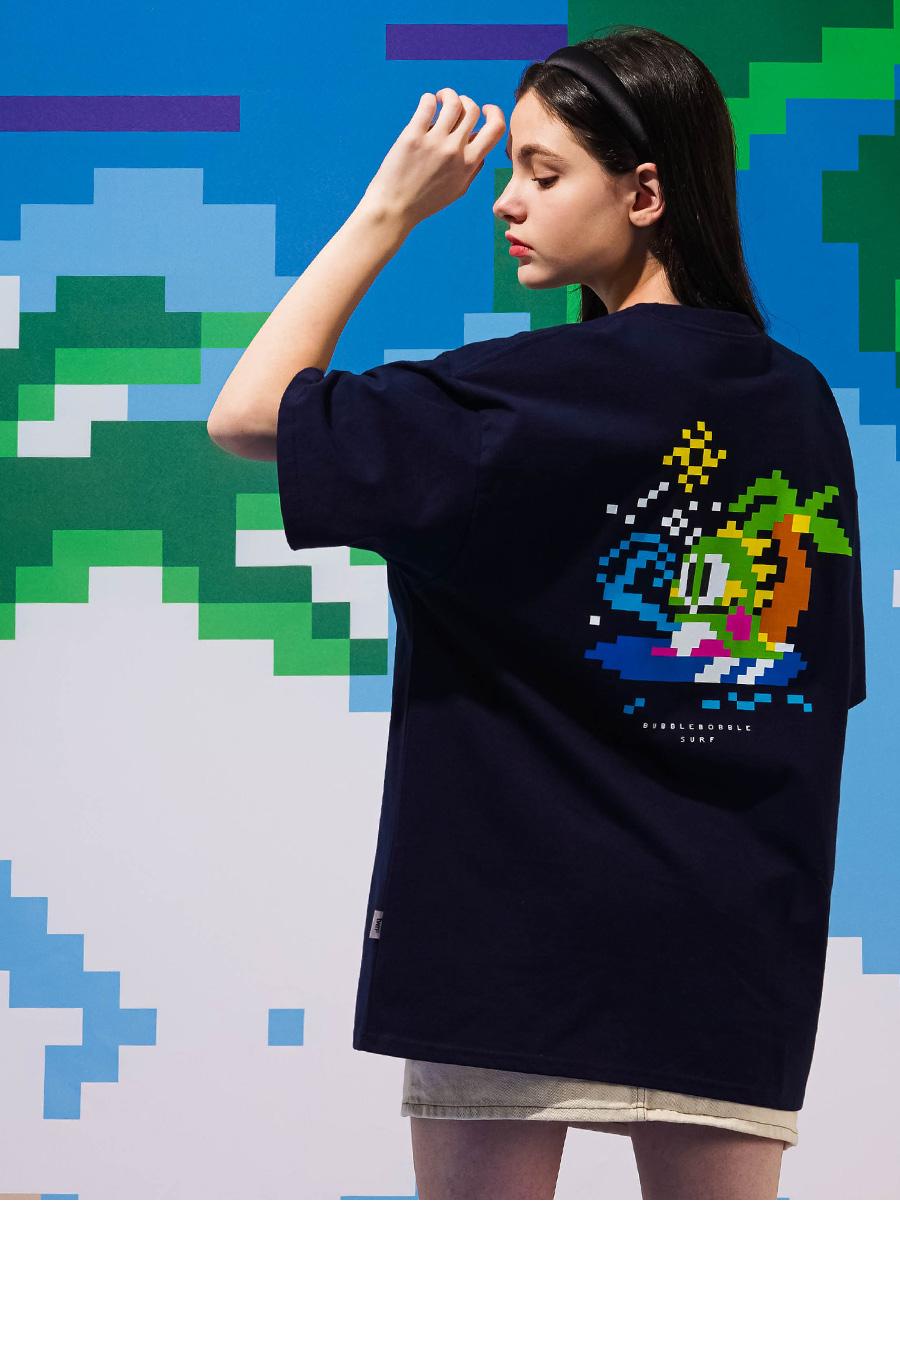 20210430_twnxbb_bubblesurf_model_ey_14.jpg